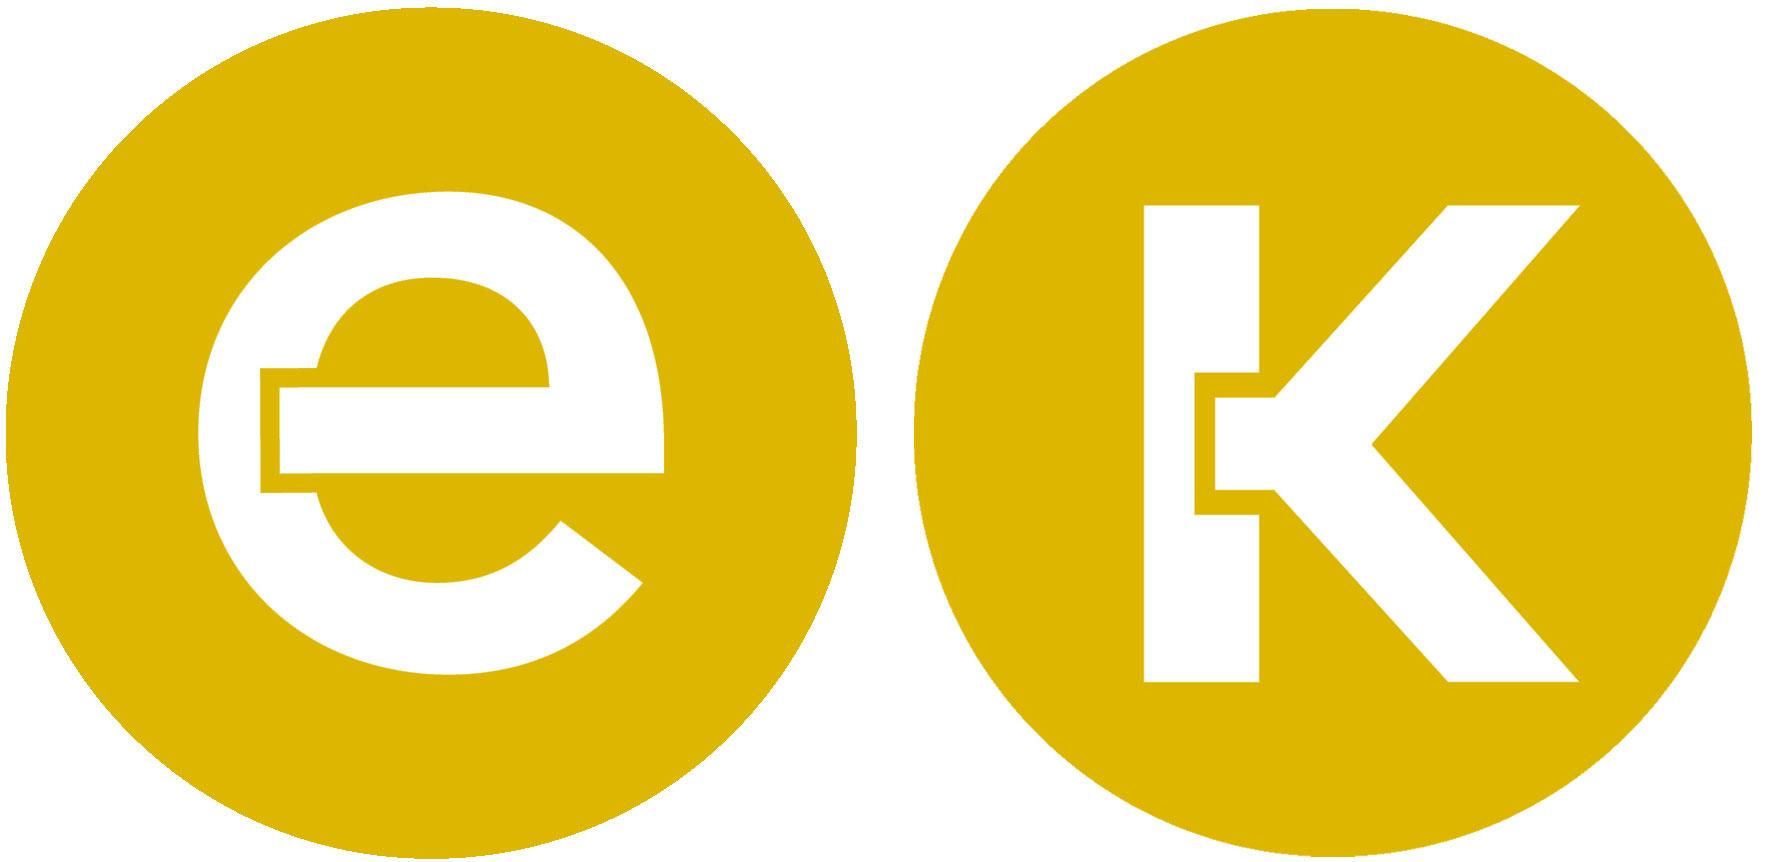 Eduwhere & Keika Blog